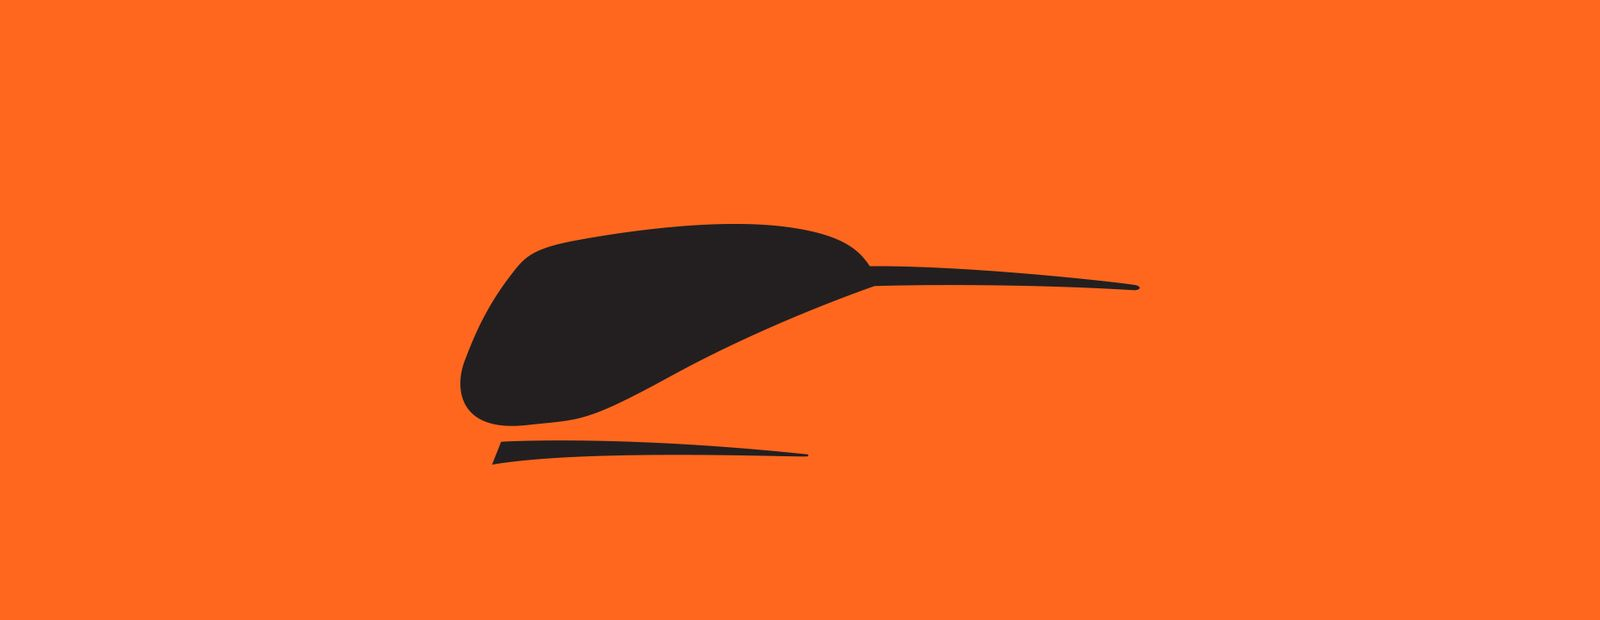 Mclaren Formula 1 Colour By Numbers And A Flightless Bird